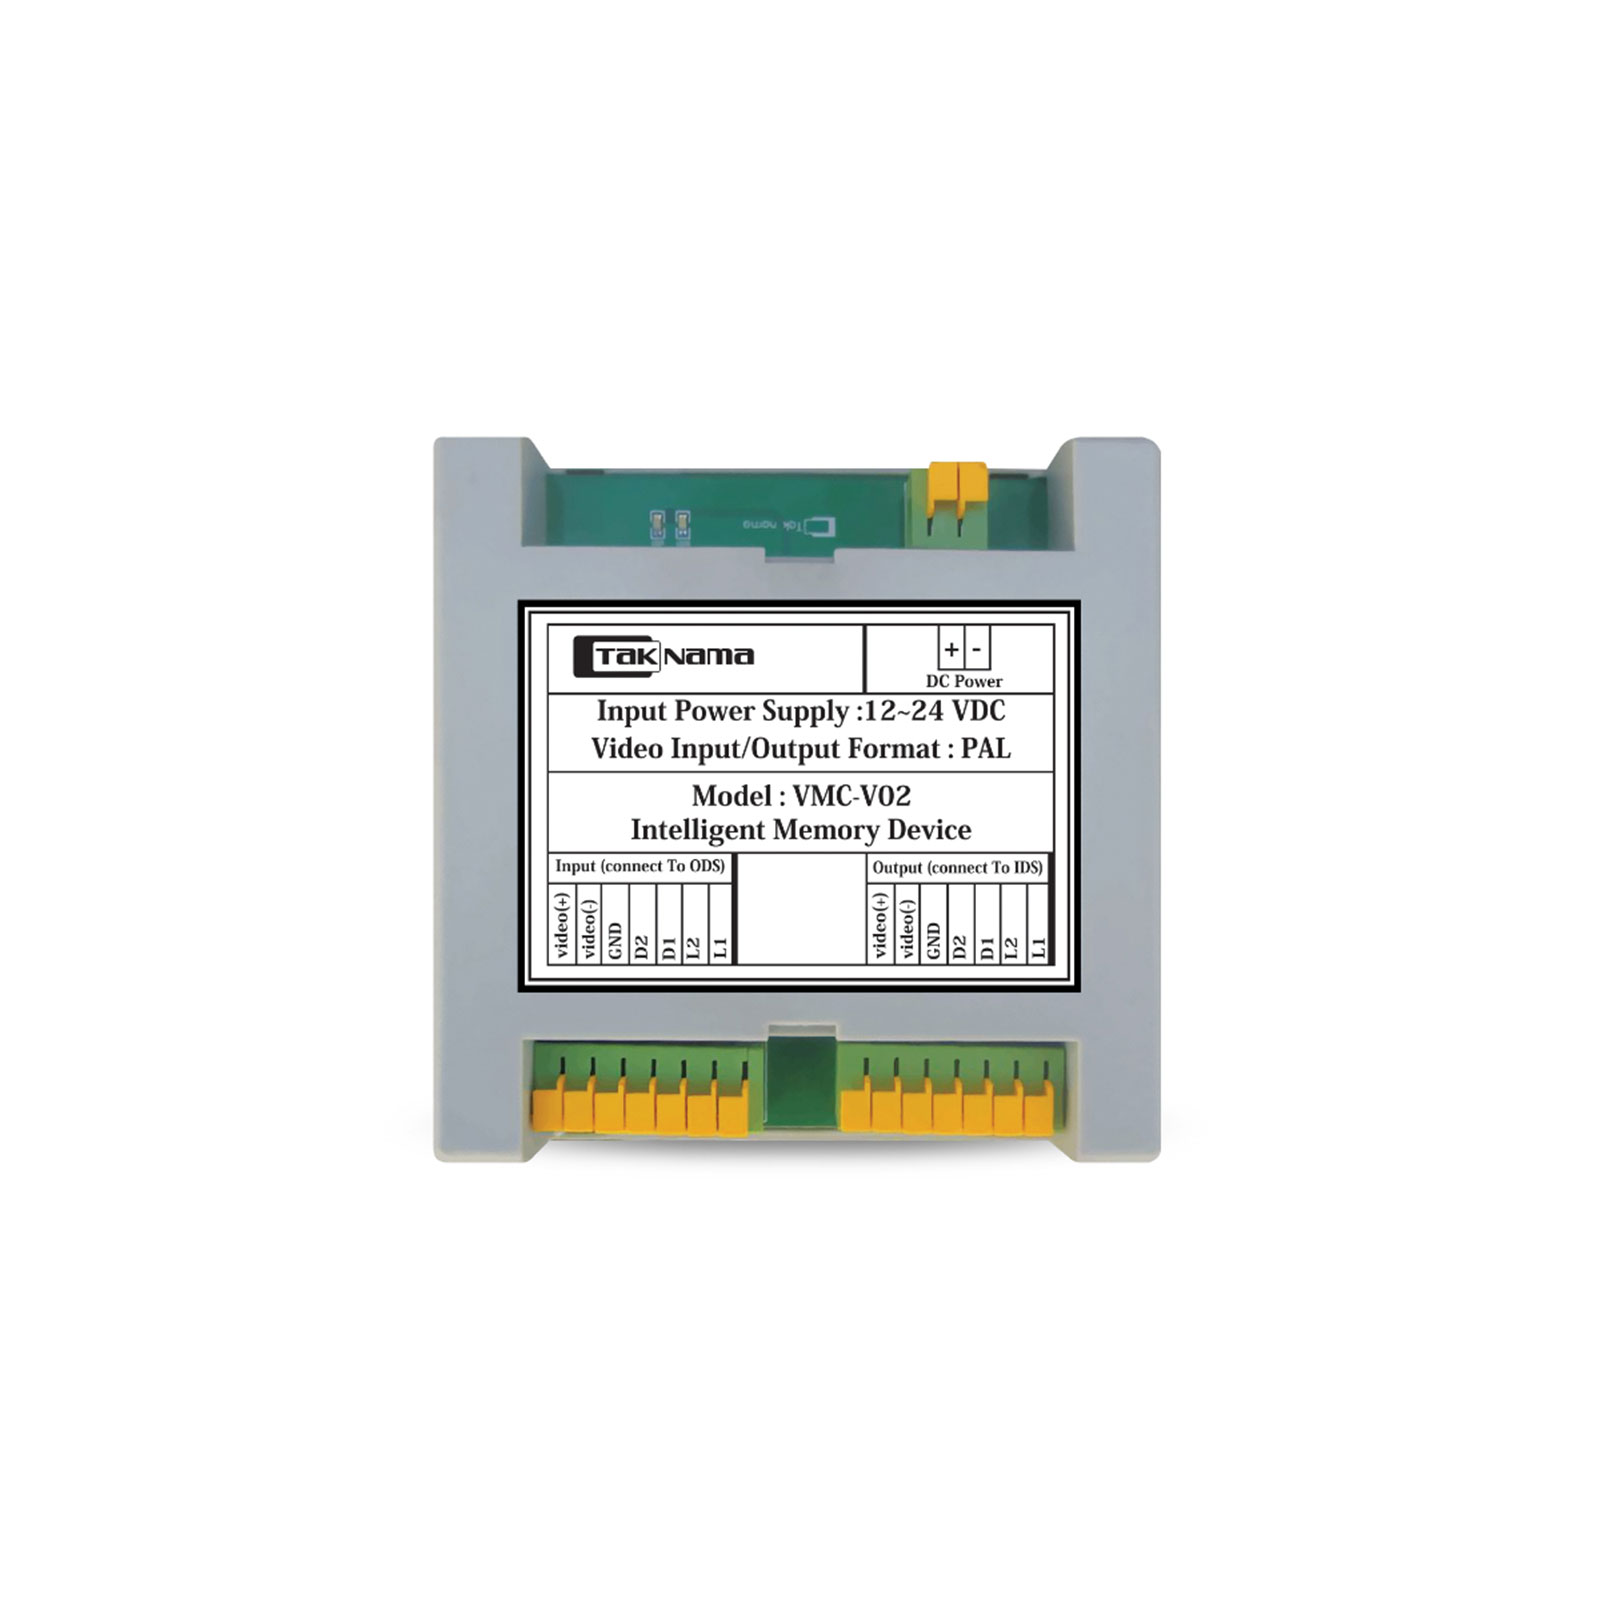 ماژول حافظه تصویر هوشمند تک نما مدل VMC-V02